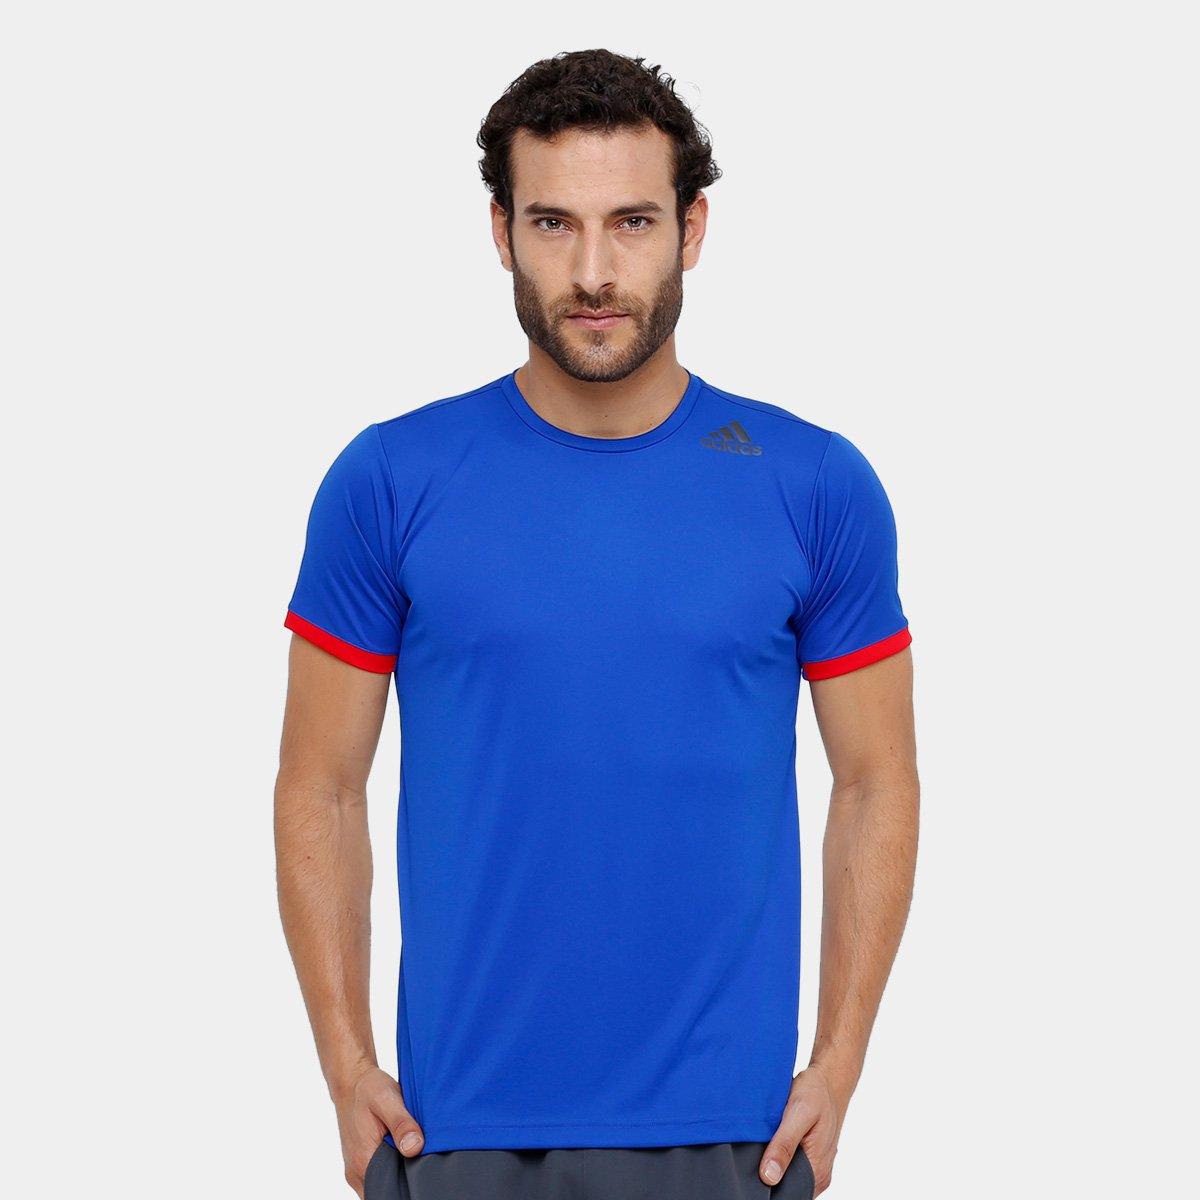 Camiseta Adidas Climalite Masculina - Azul - Compre Agora   Netshoes 686b437bbe